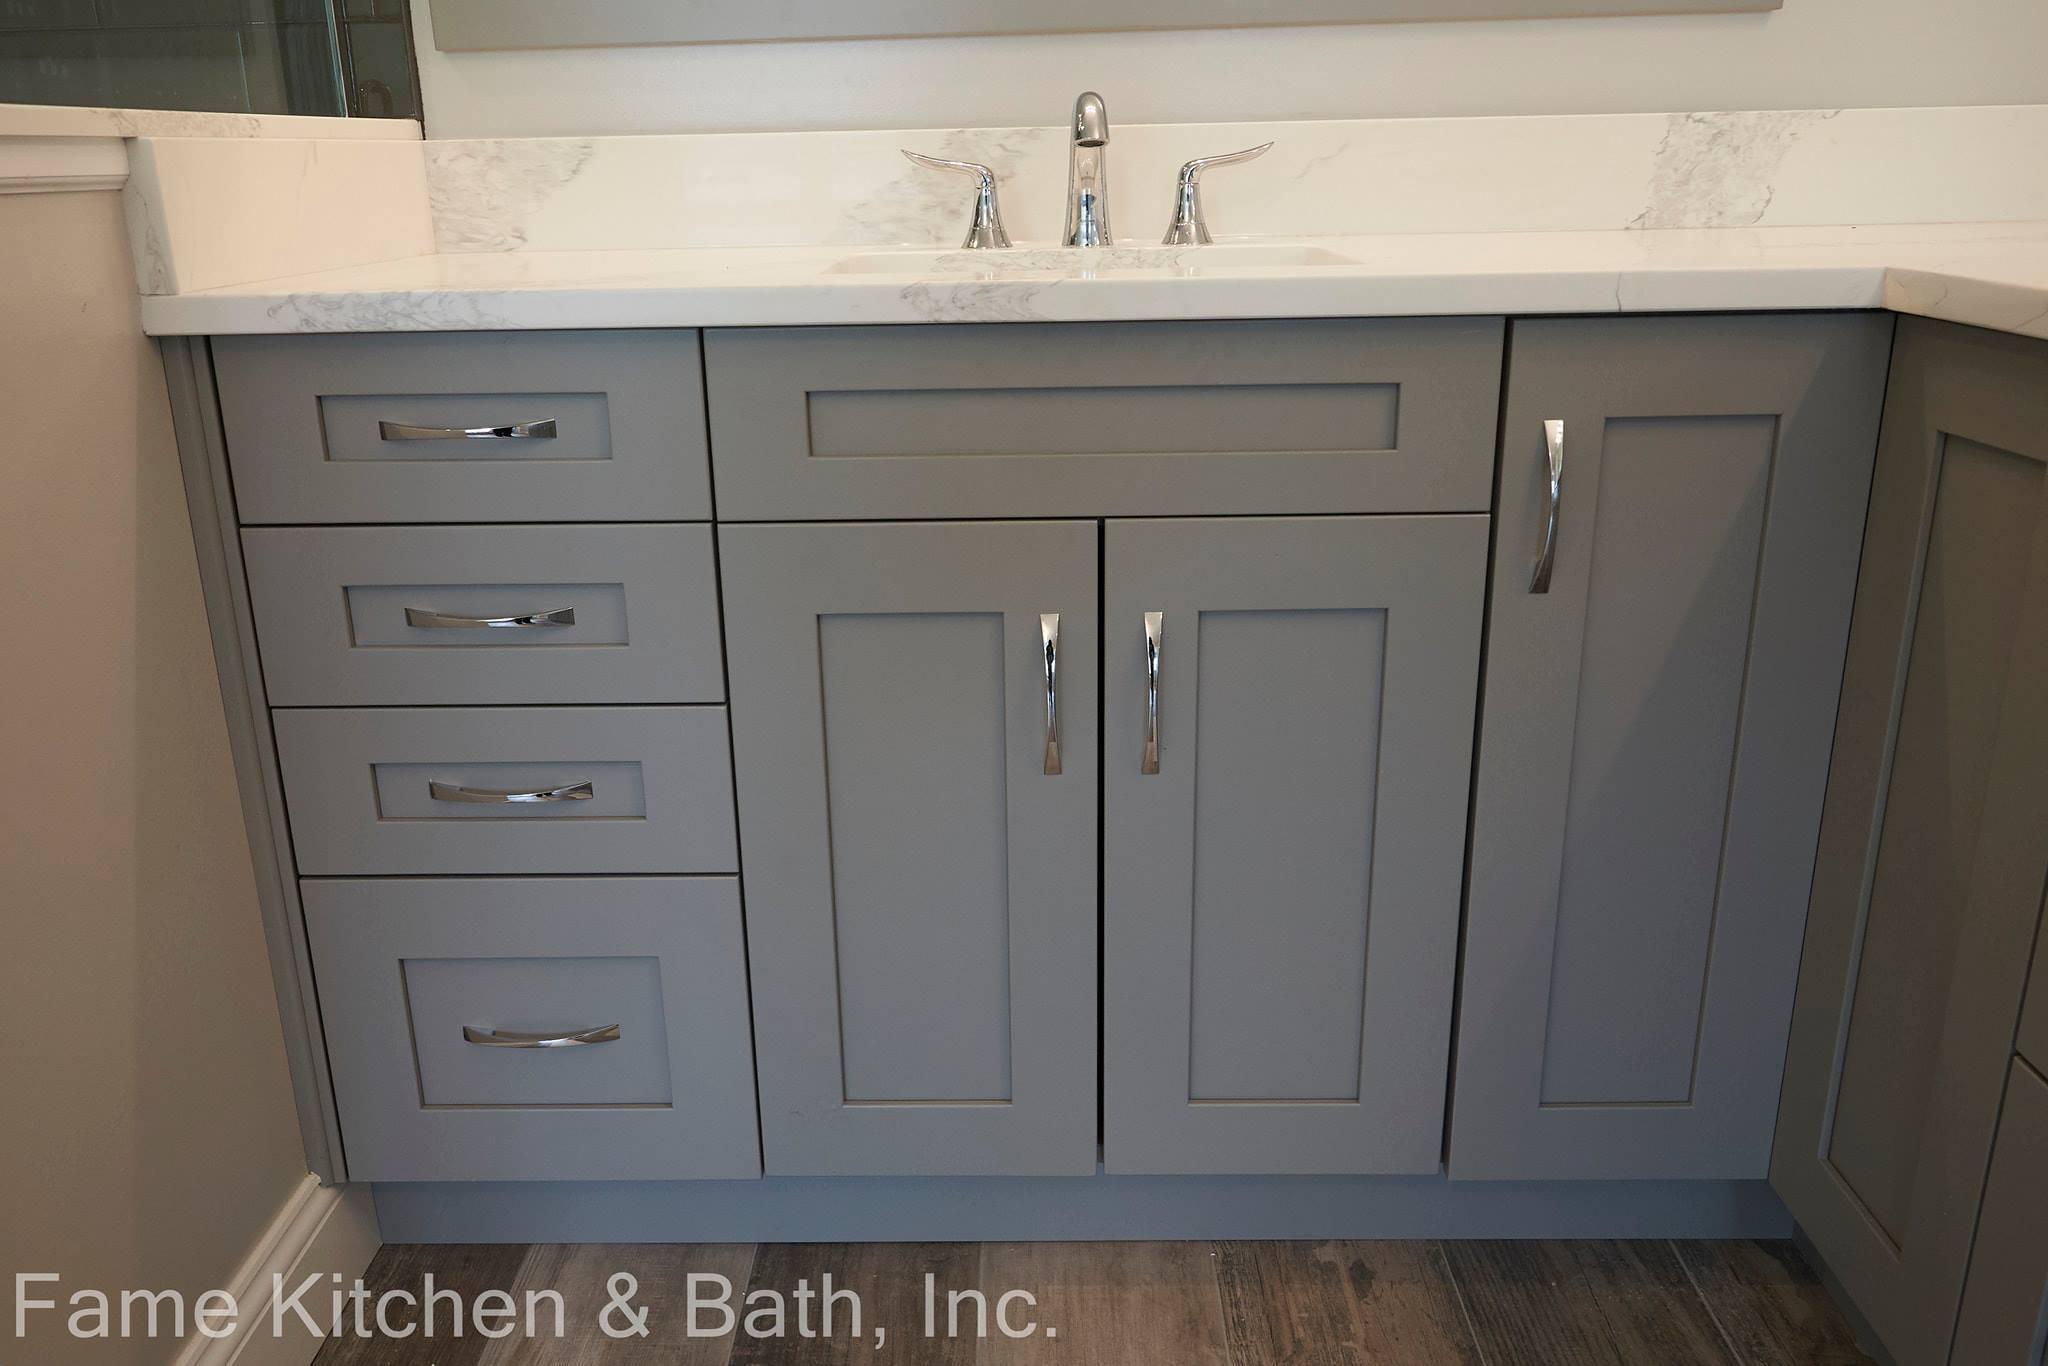 Fame kitchen bath gaithersburg maryland bath remodeling - Bathroom remodeling montgomery county md ...